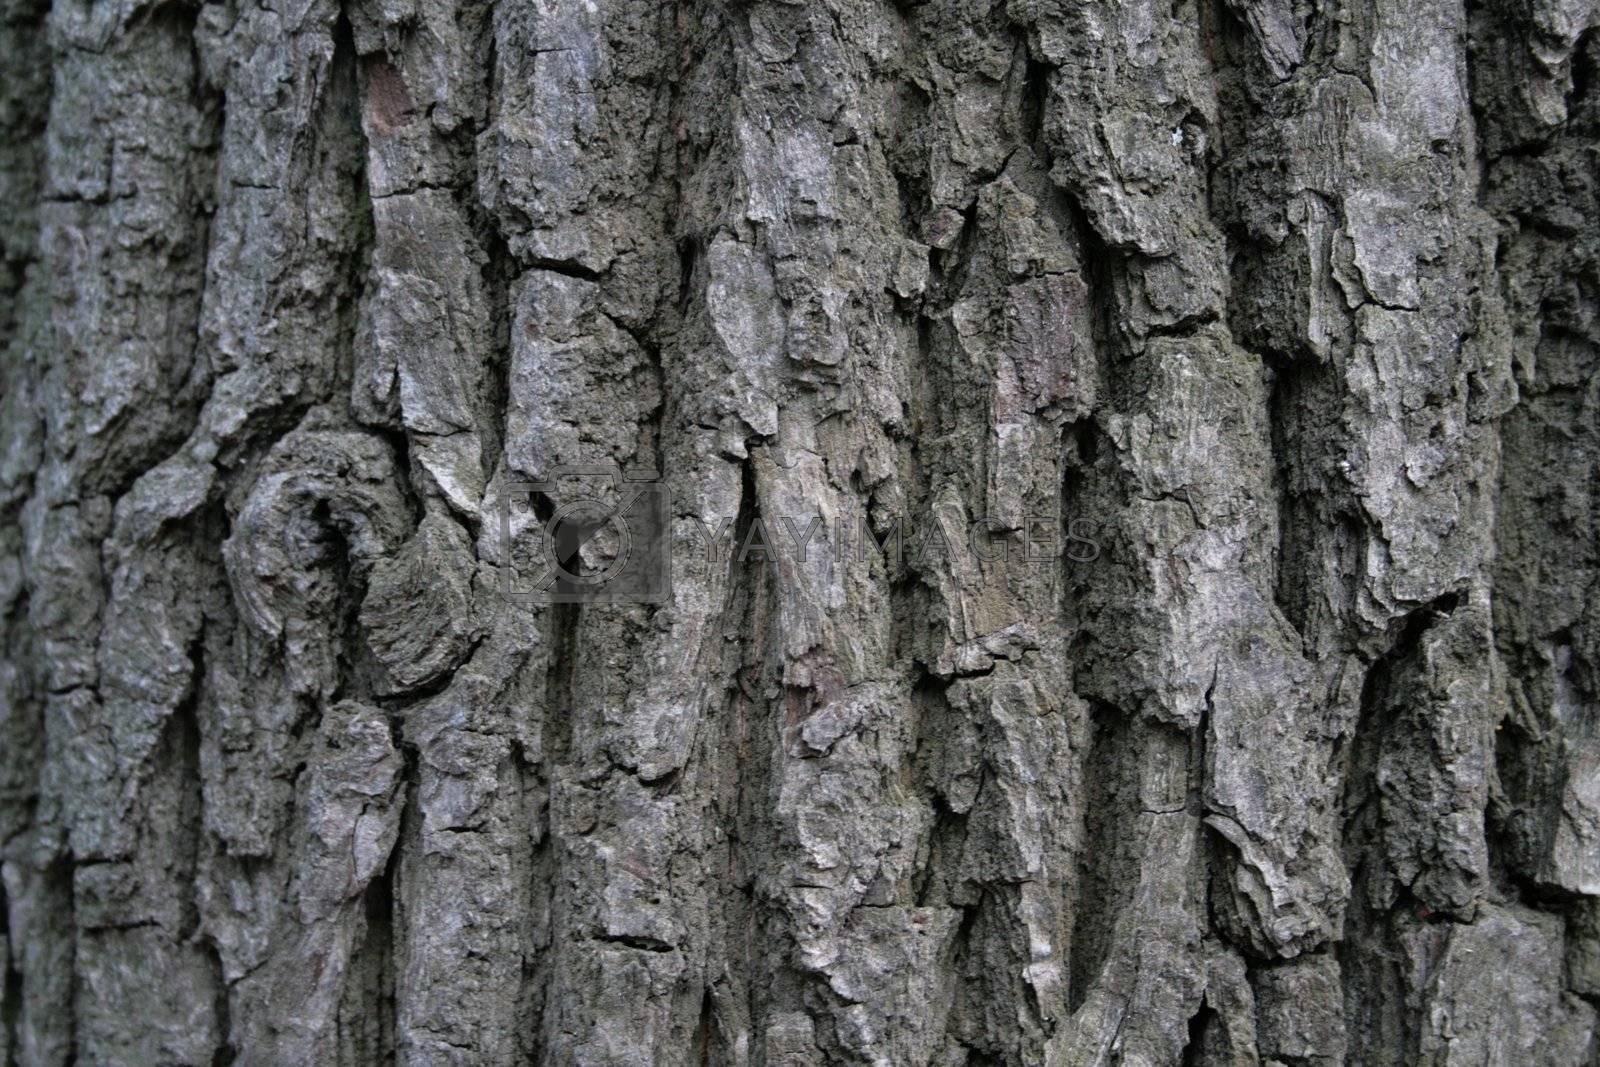 close-up of ald tree bark